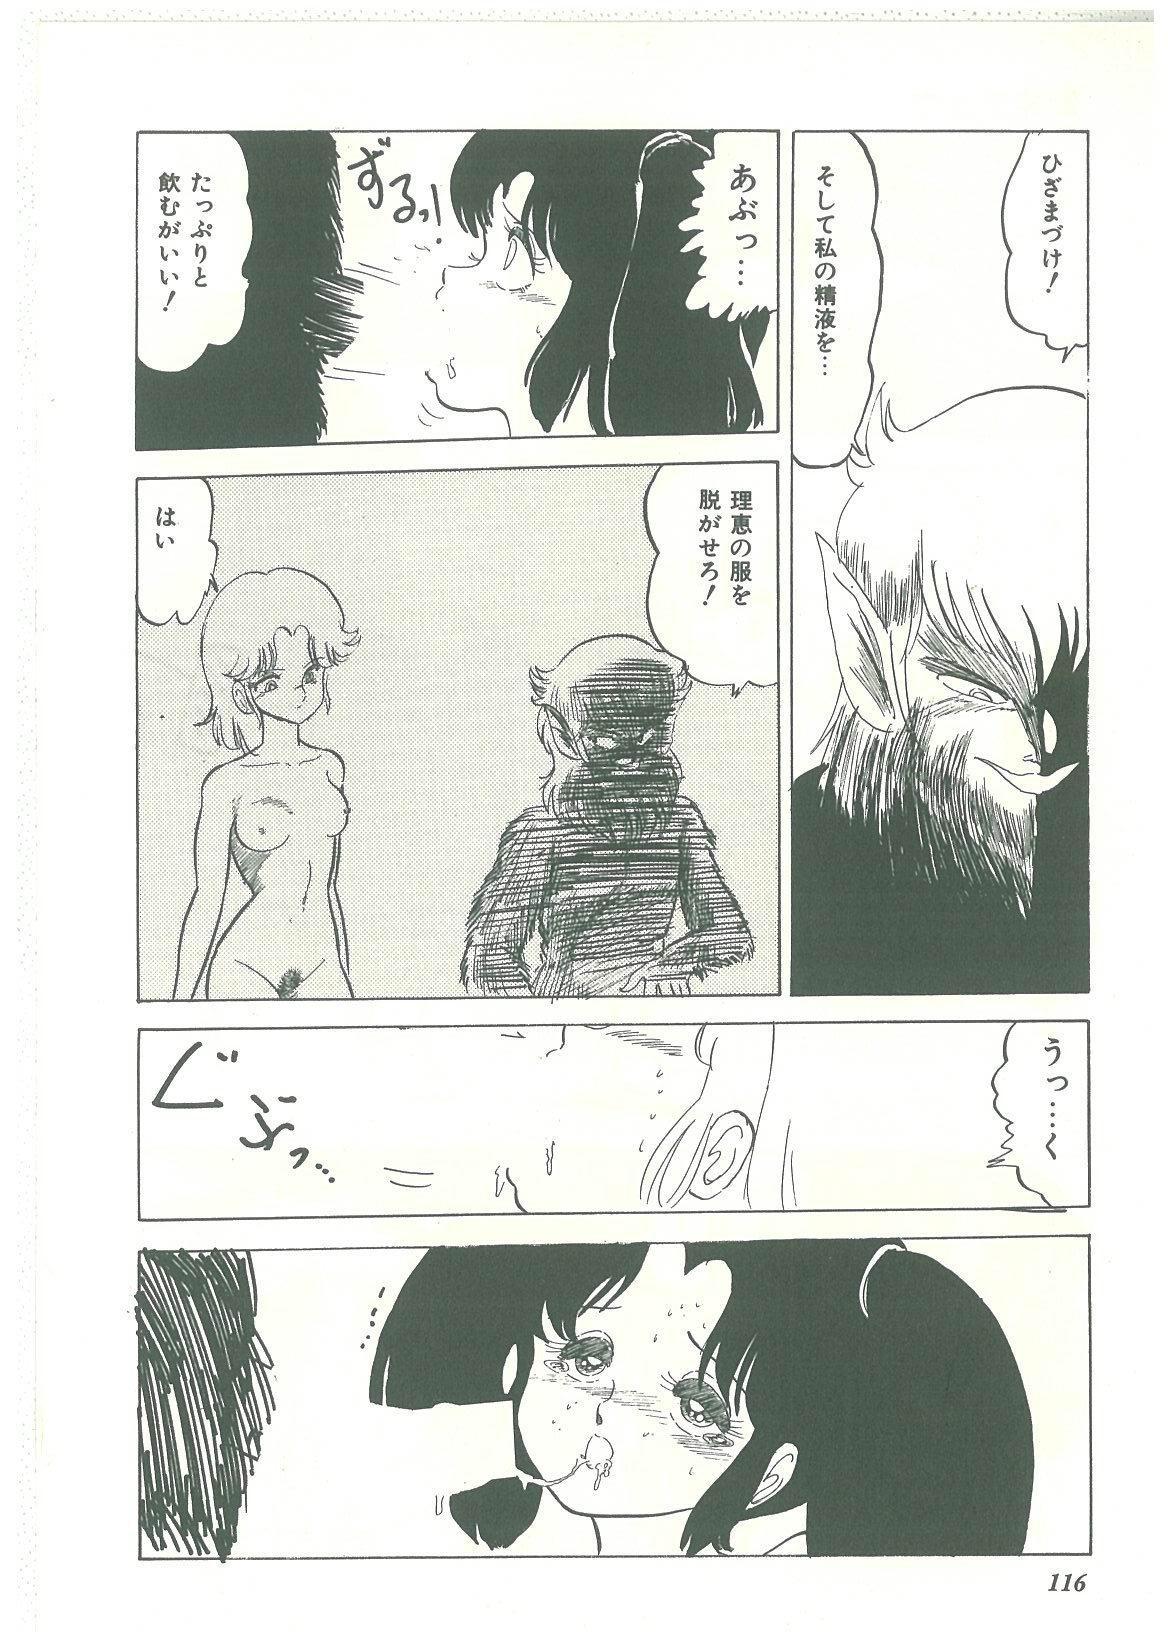 Lolikko Kiss 113